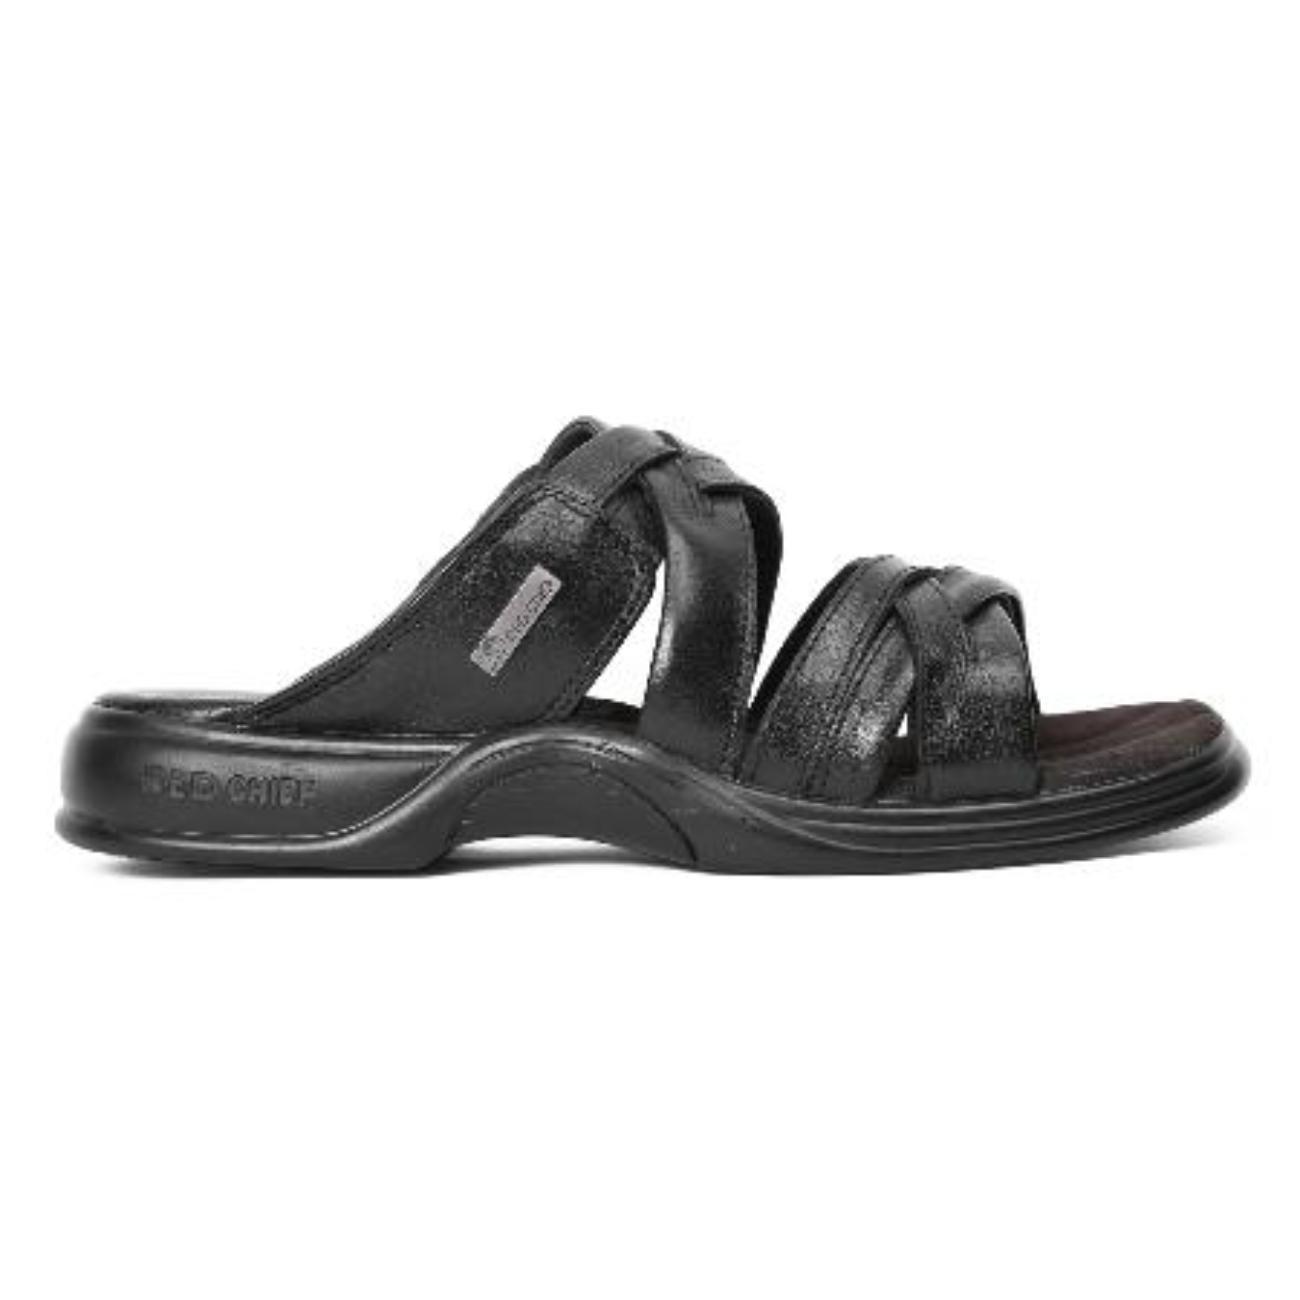 buy black slip-on slippers side view_1